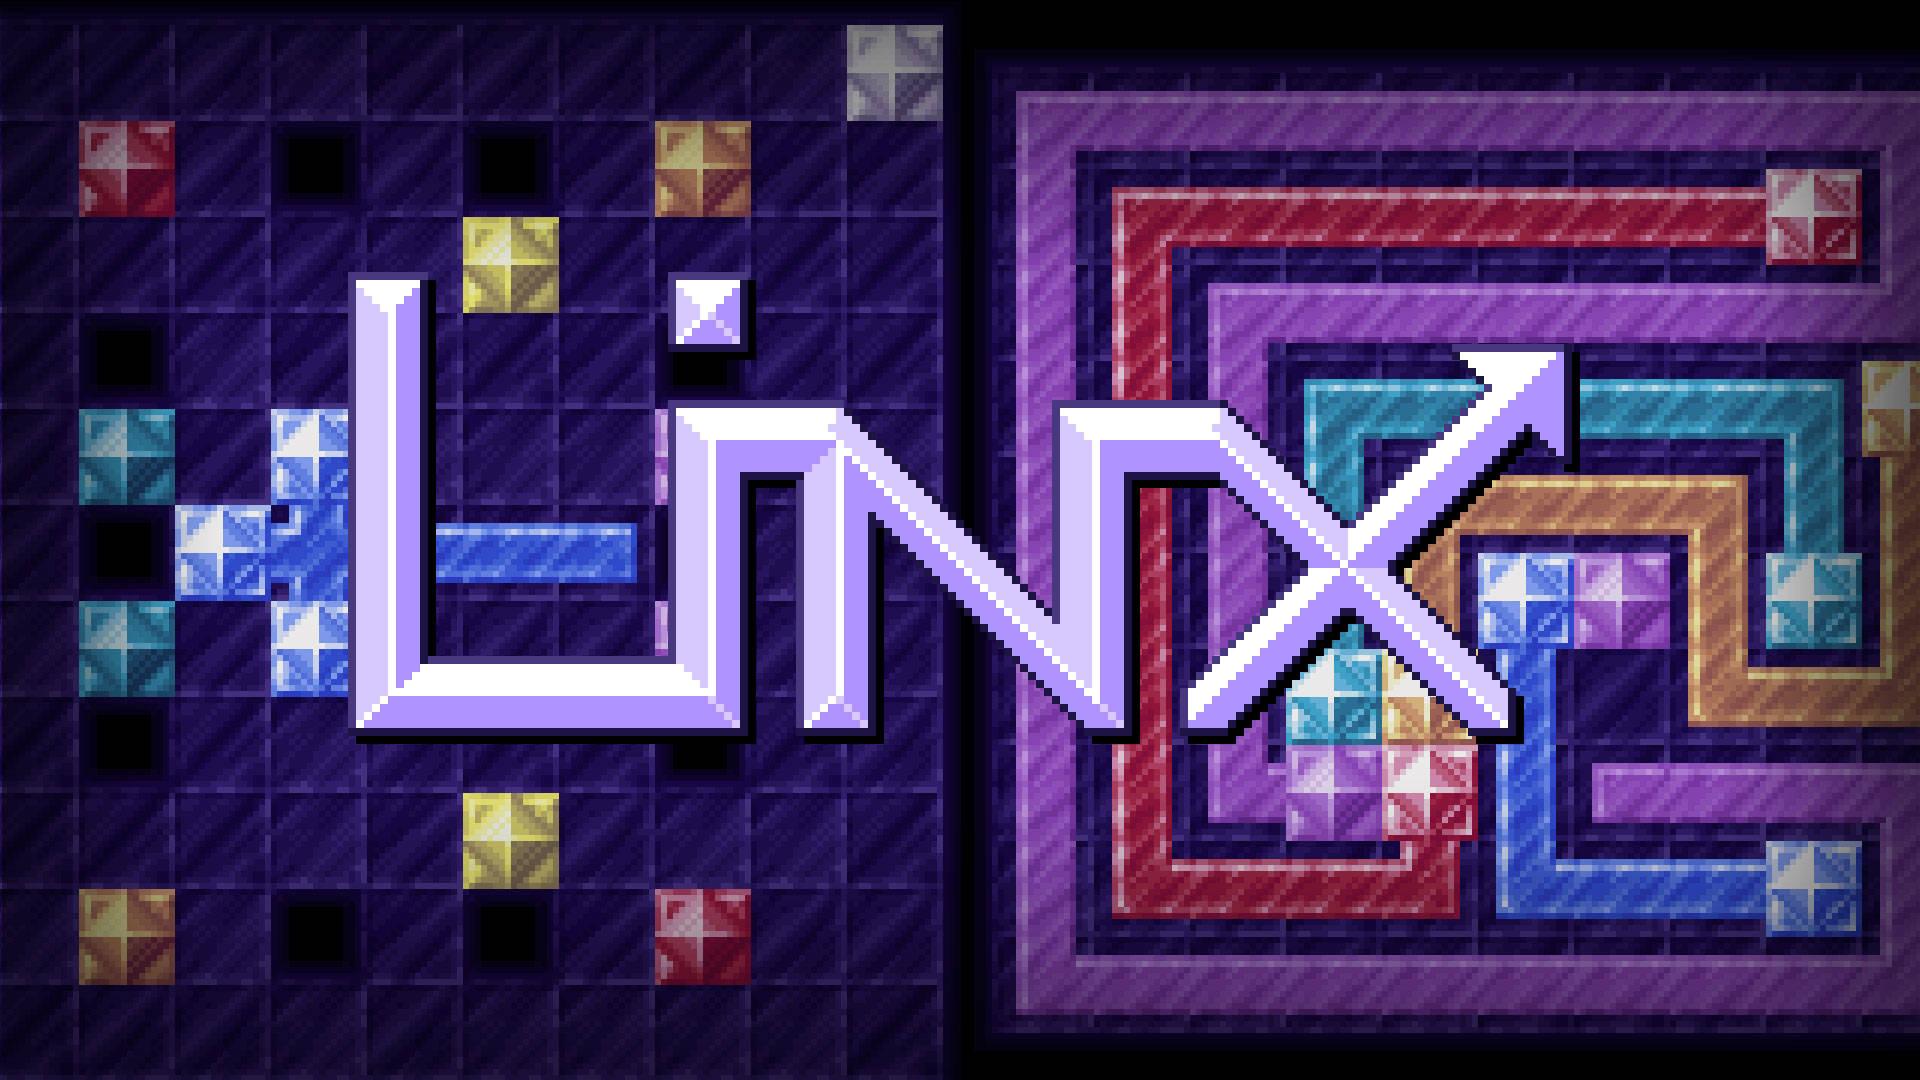 Linx image